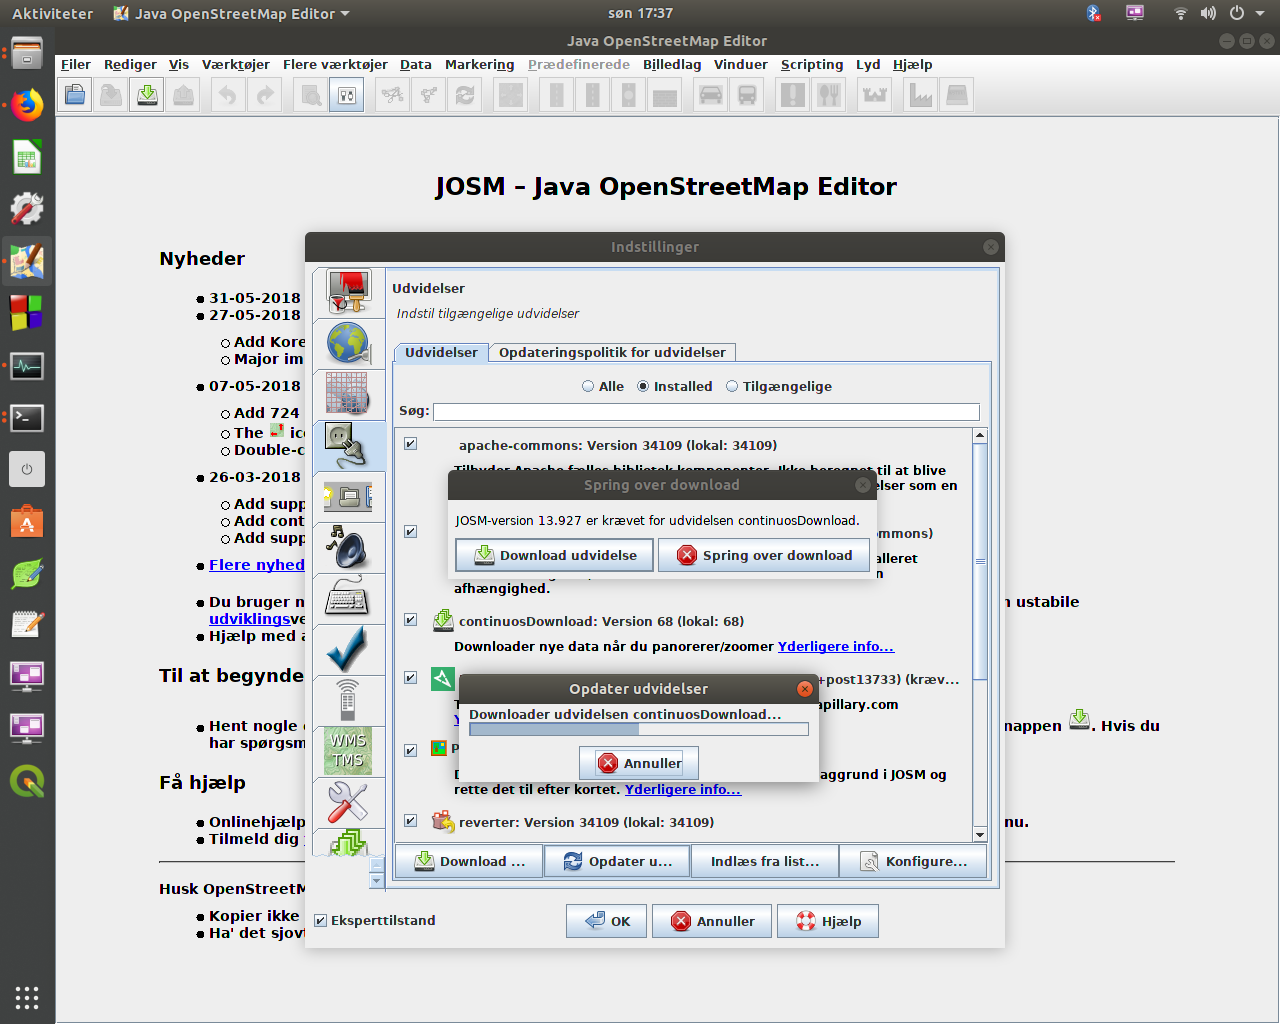 java download image from https url